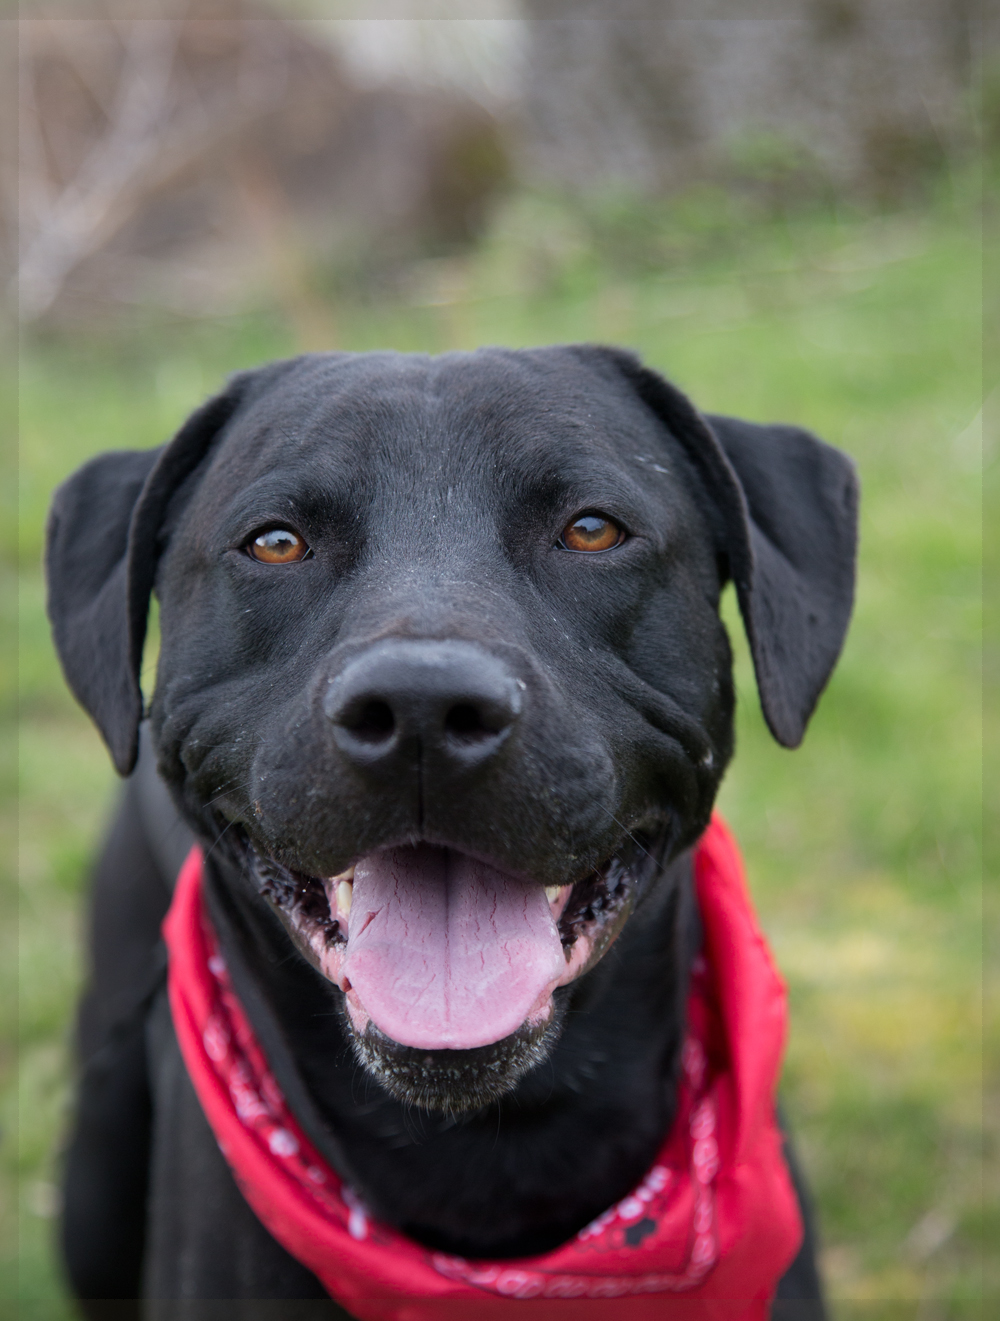 shelter dogs of portland quotchicoquot black labpitbull mix